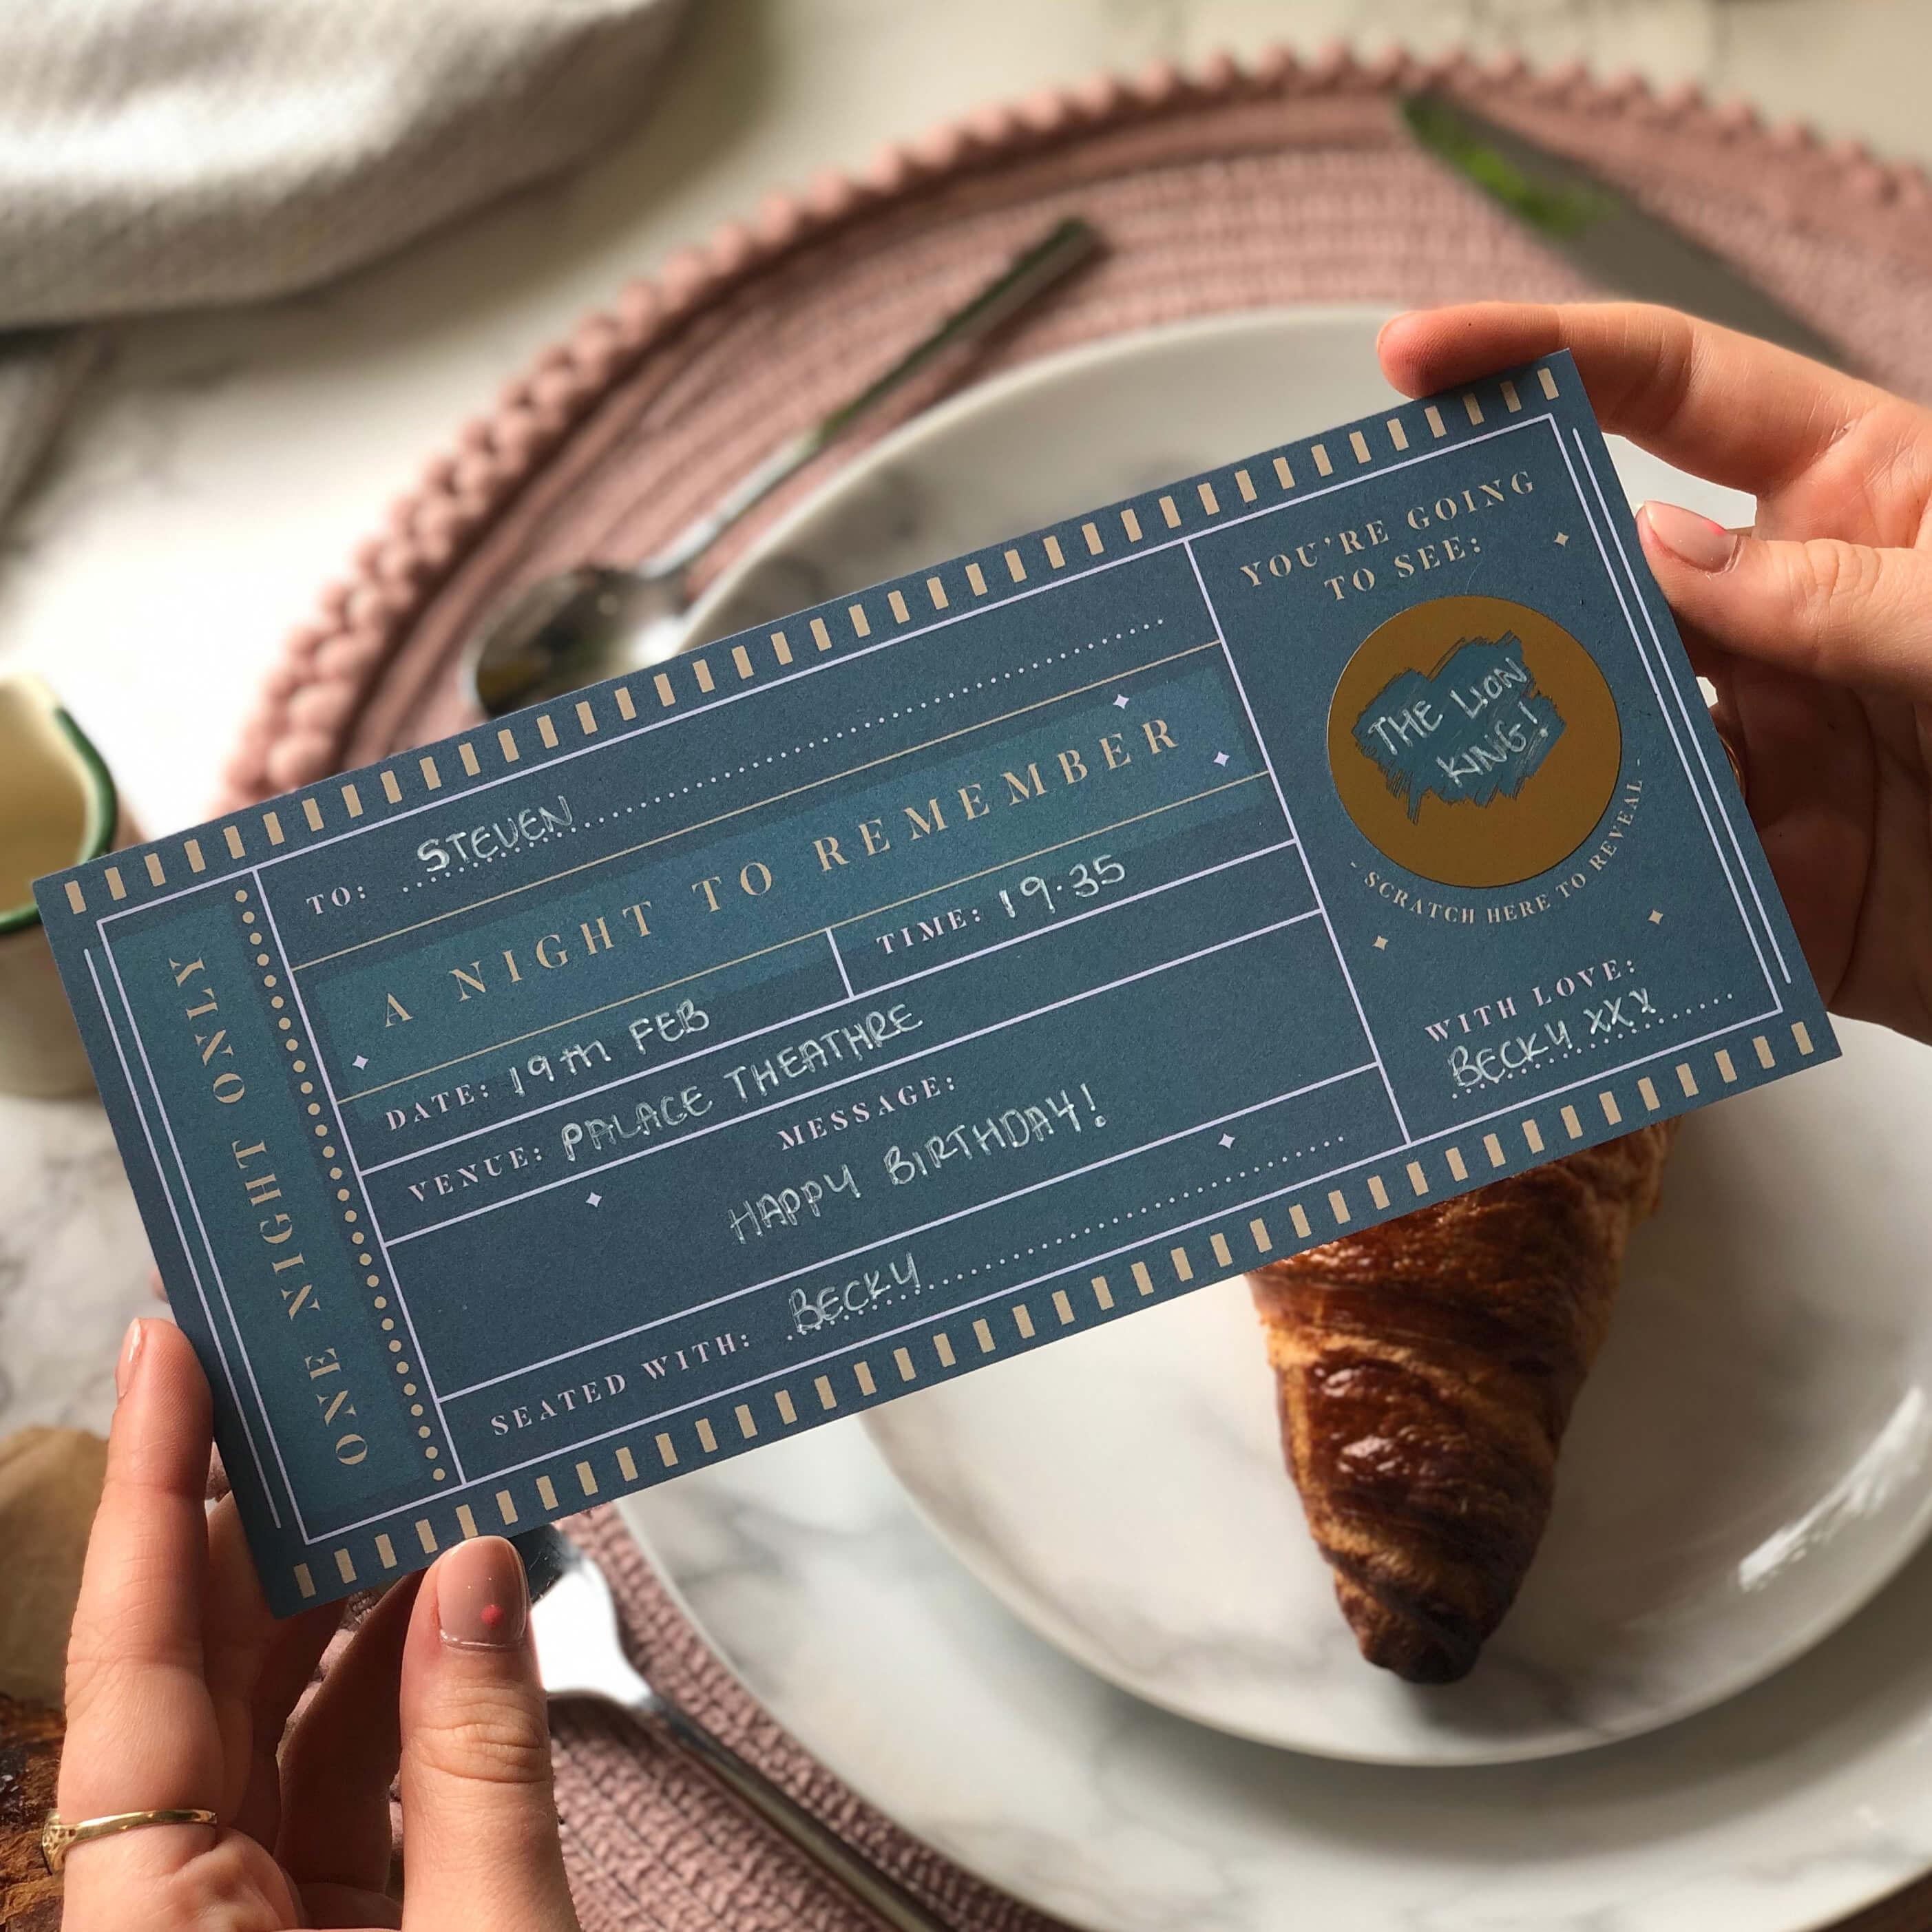 Theatre Scratch Off Ticket - Designed by Rodo Creative